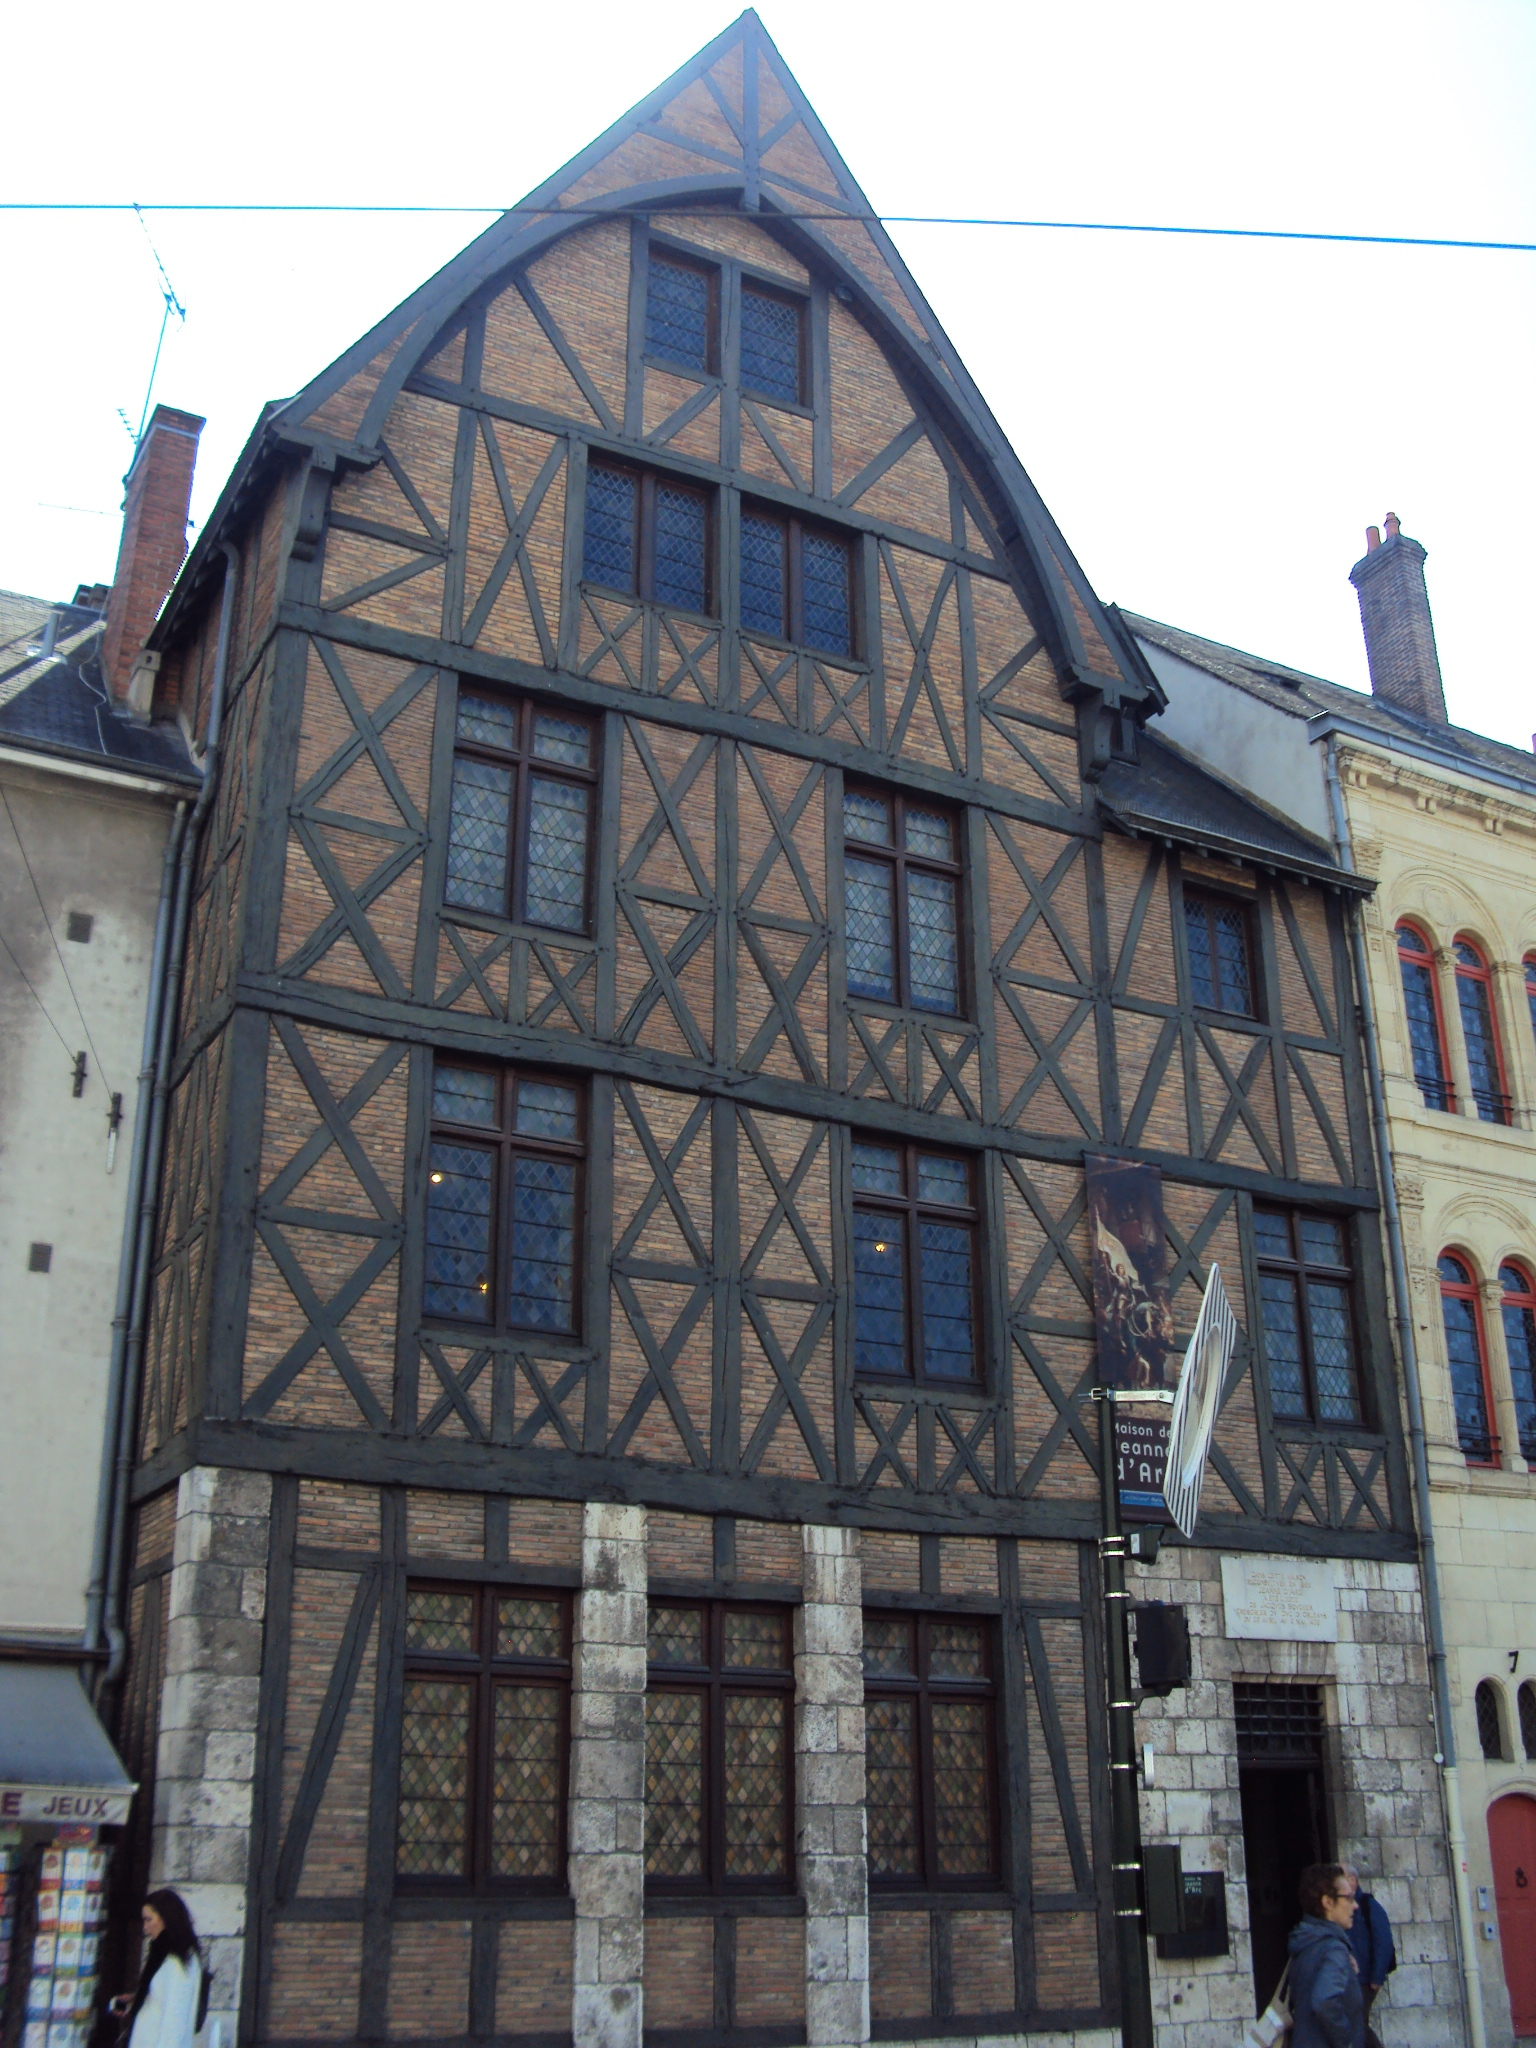 https://upload.wikimedia.org/wikipedia/commons/c/cb/Maison_de_Jeanne_d%27Arc%2C_Orl%C3%A9ans.JPG